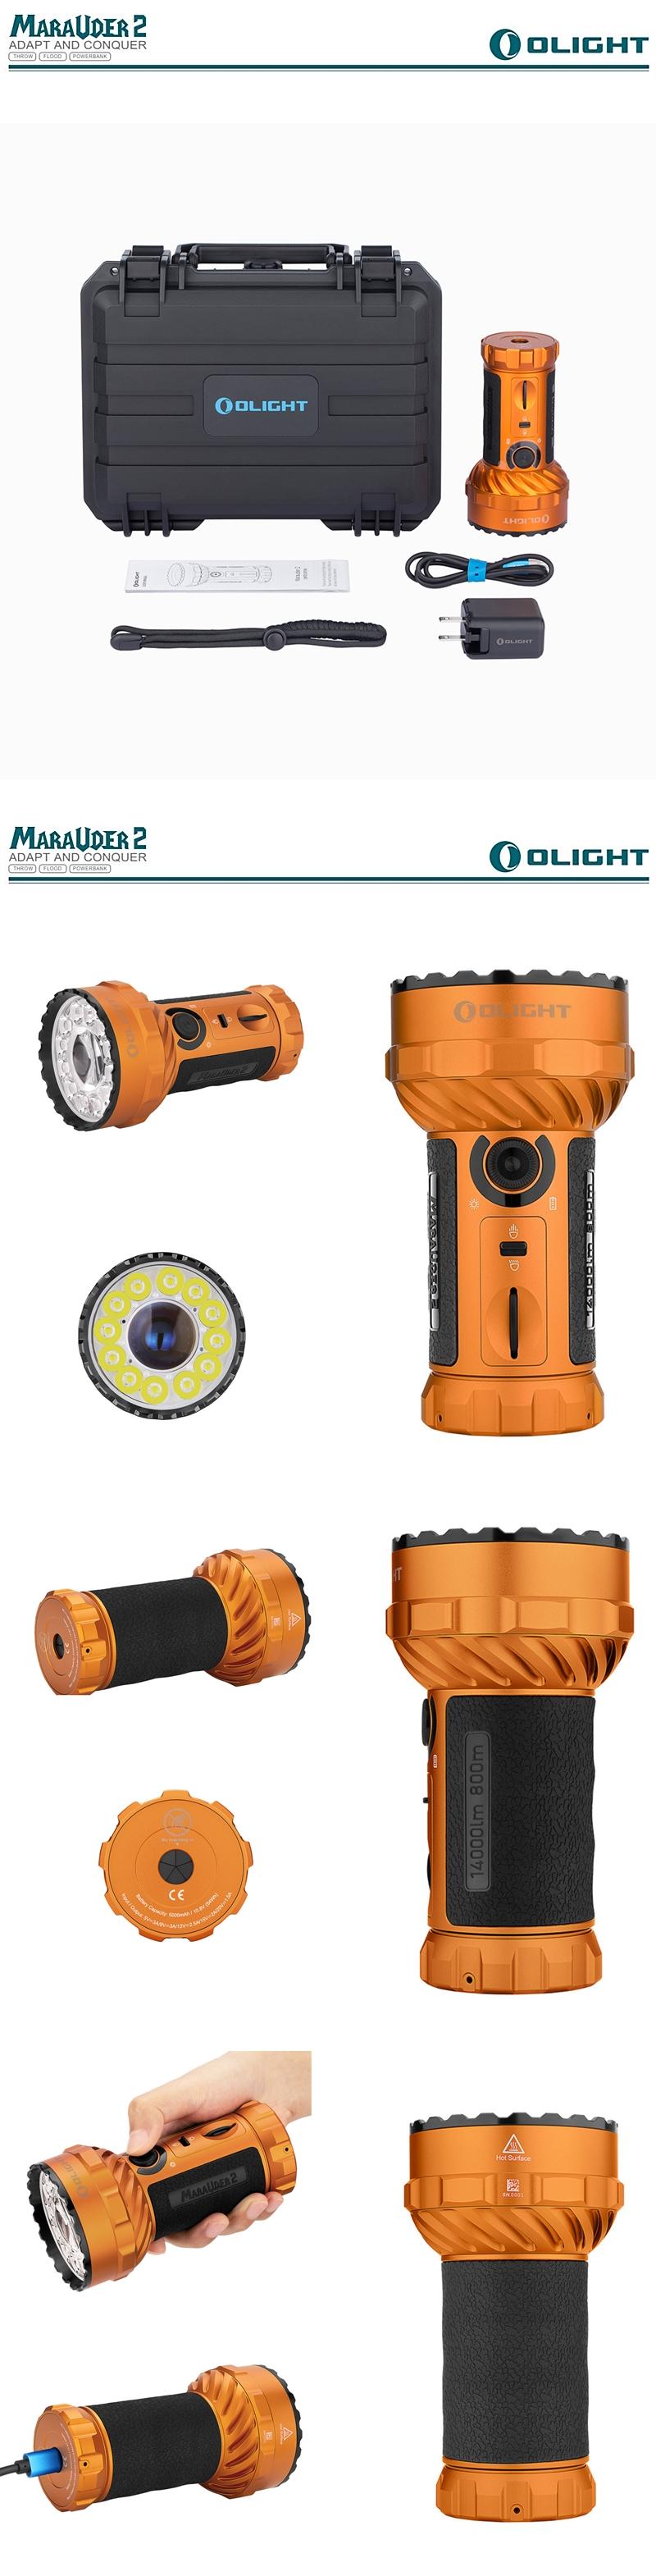 OLIGHT Marauder 2 橘 Orange 遠射搜索強光LED手電筒 遠近雙光 14000 流明 轉盤調光 USB-C充電 可當行動電源    (2)